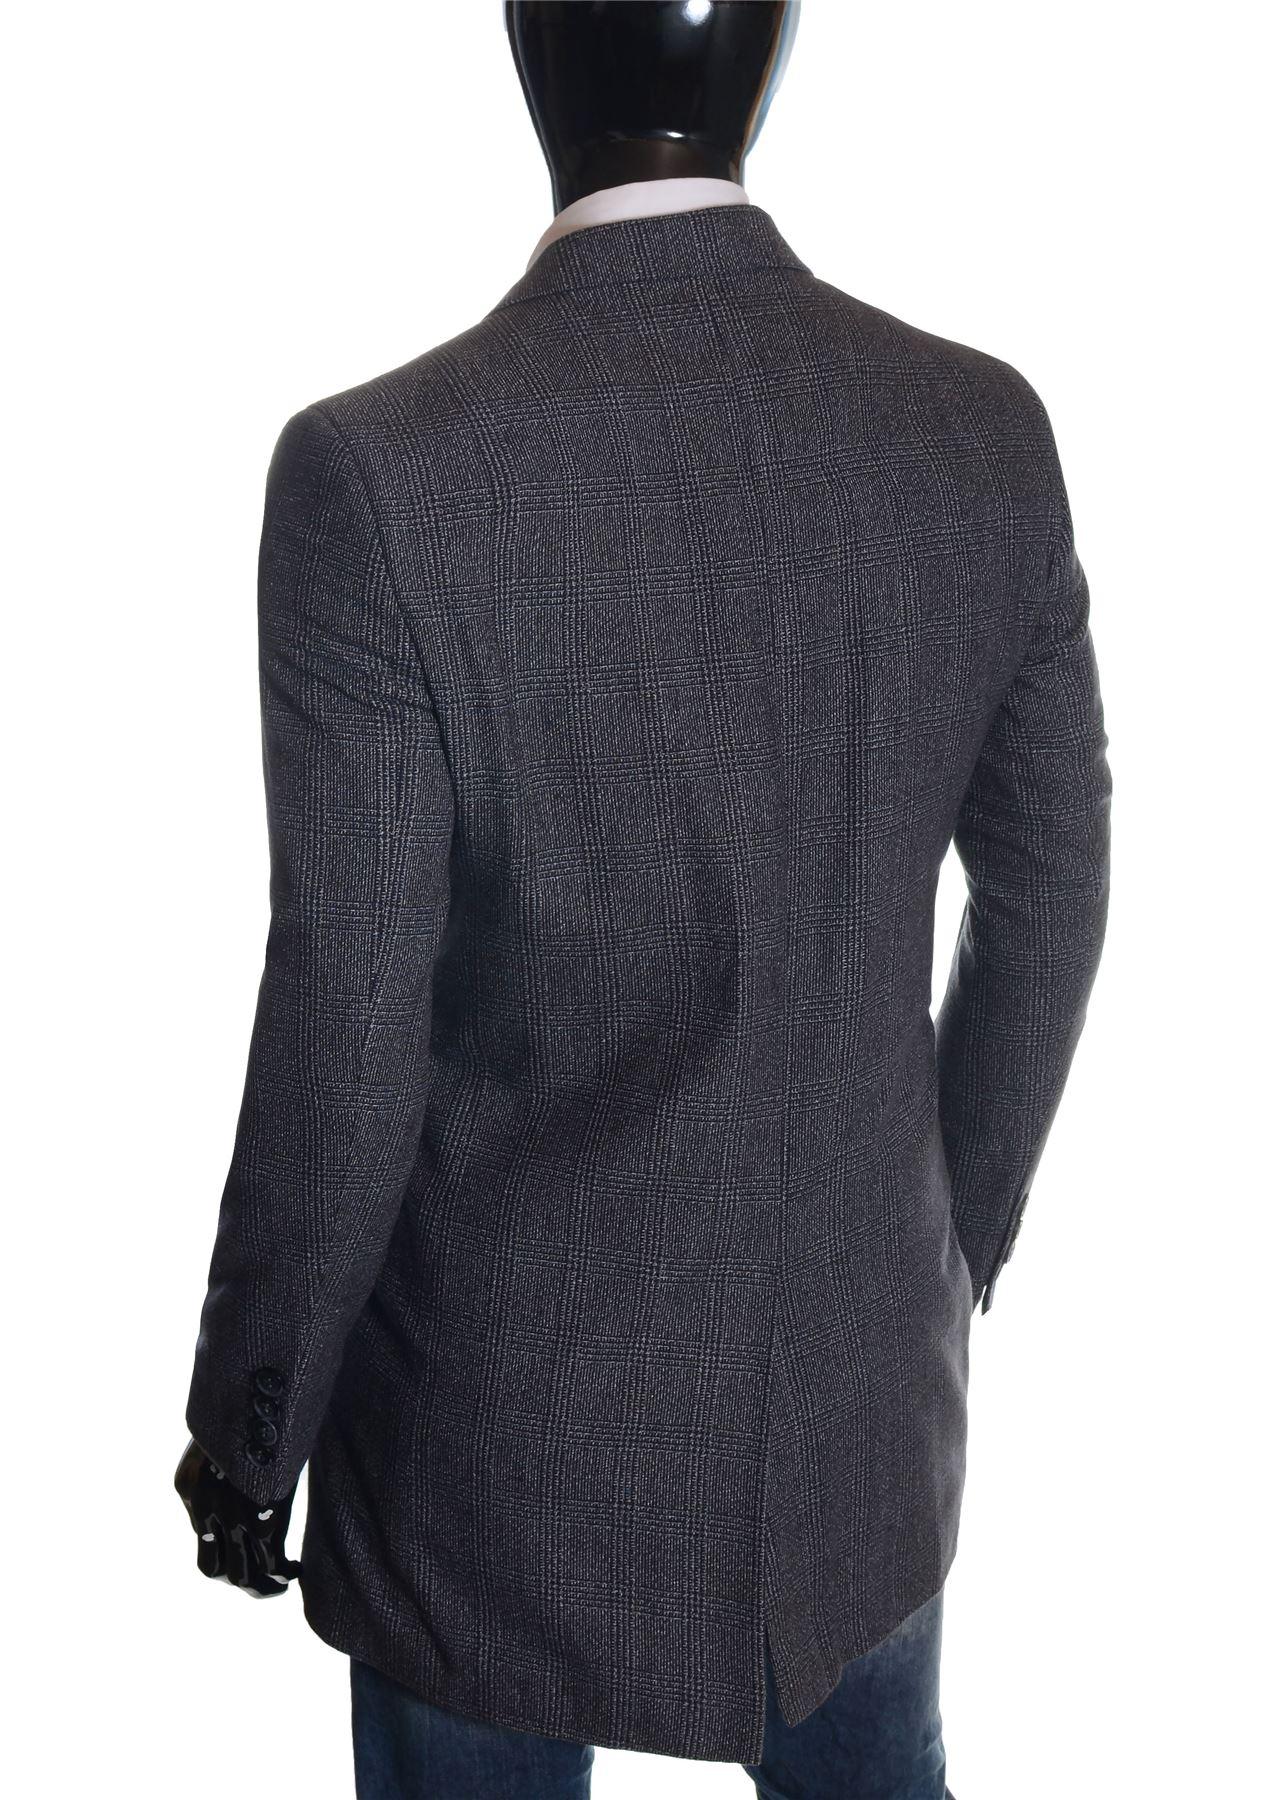 Men-039-s-Checkered-Coat-3-4-Long-Tweed-Cashmere-Wool-Trendy-Formal-Winter-Overcoat thumbnail 29